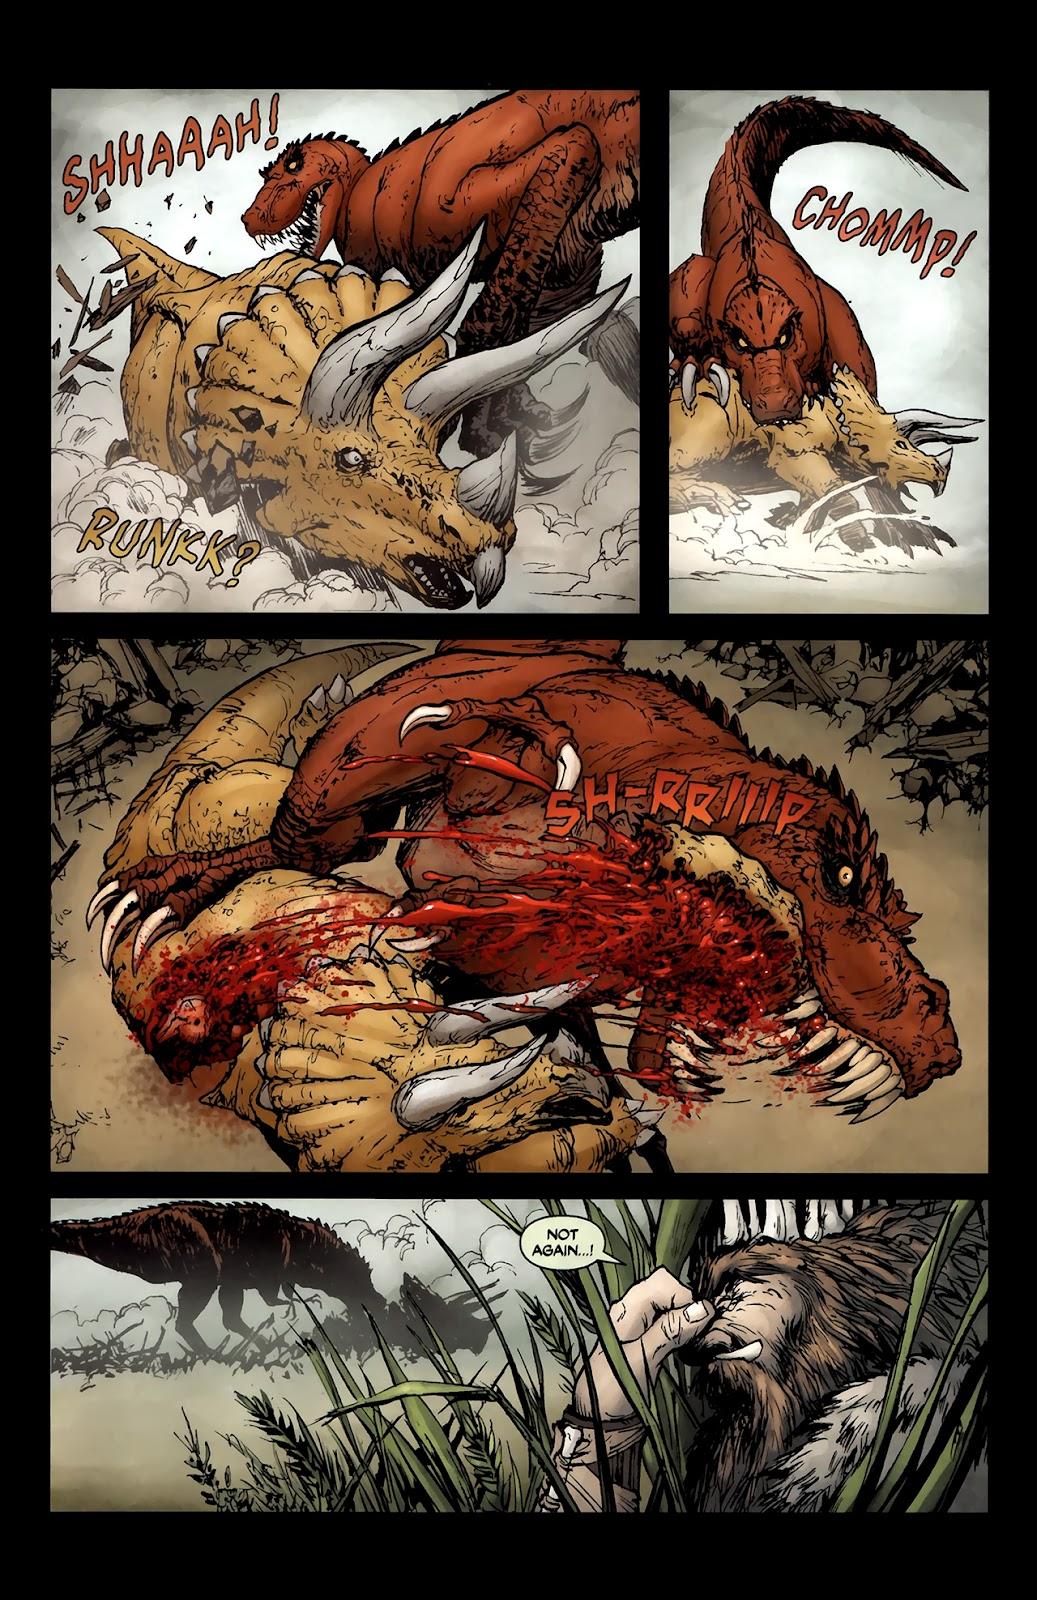 Read online Tyrannosaurus Rex comic -  Issue # Full - 6